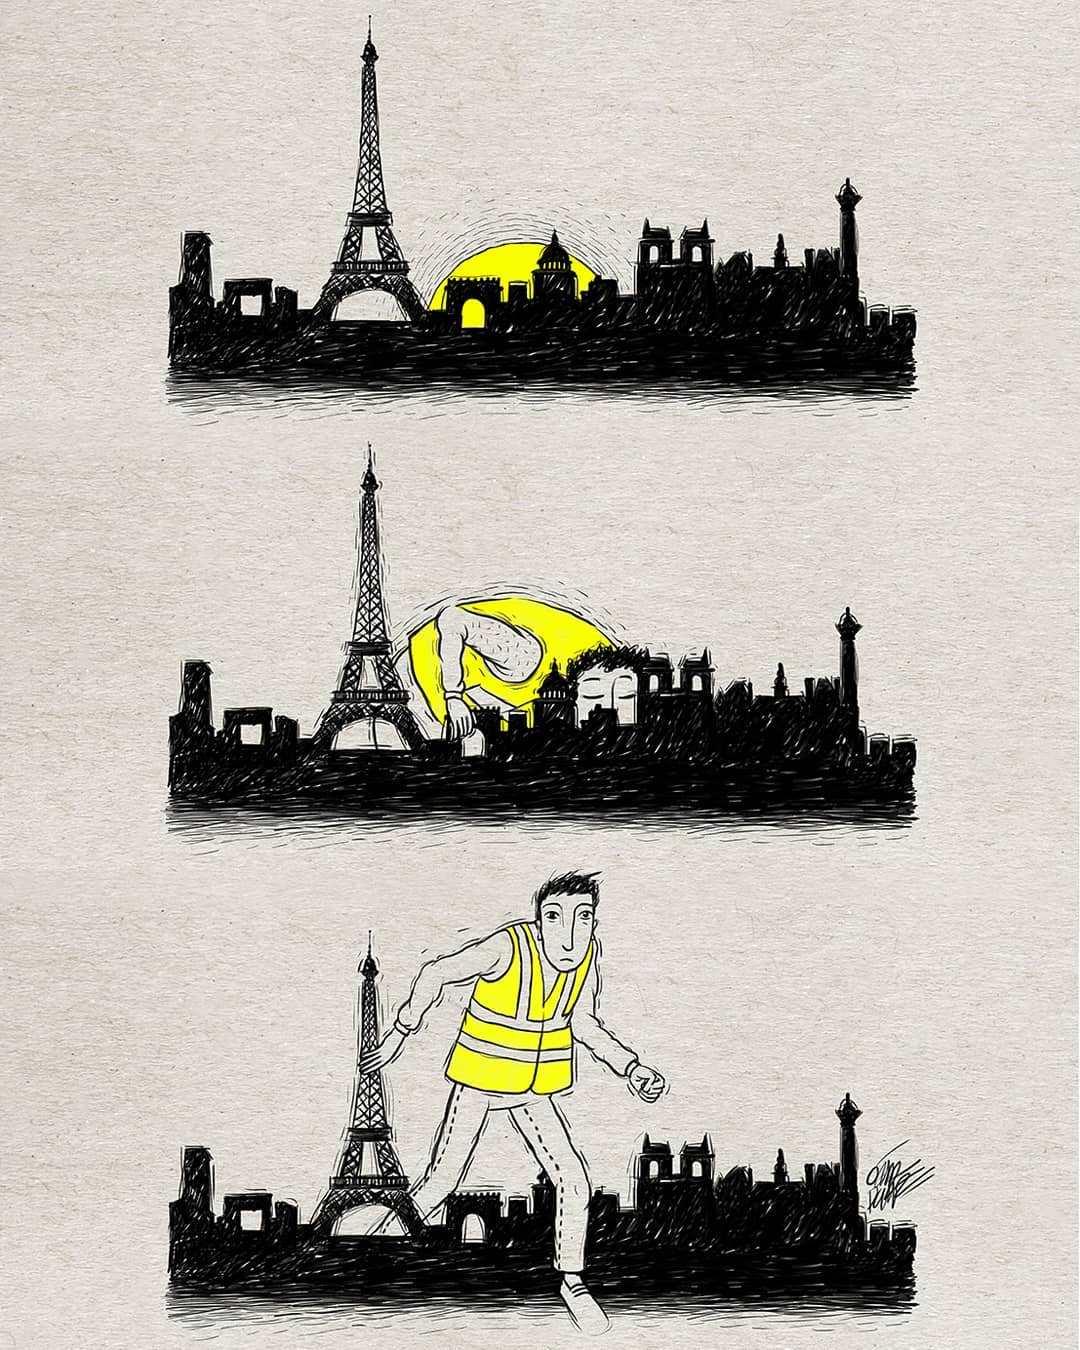 gilets-jaunes-memes-internet-trendland-9